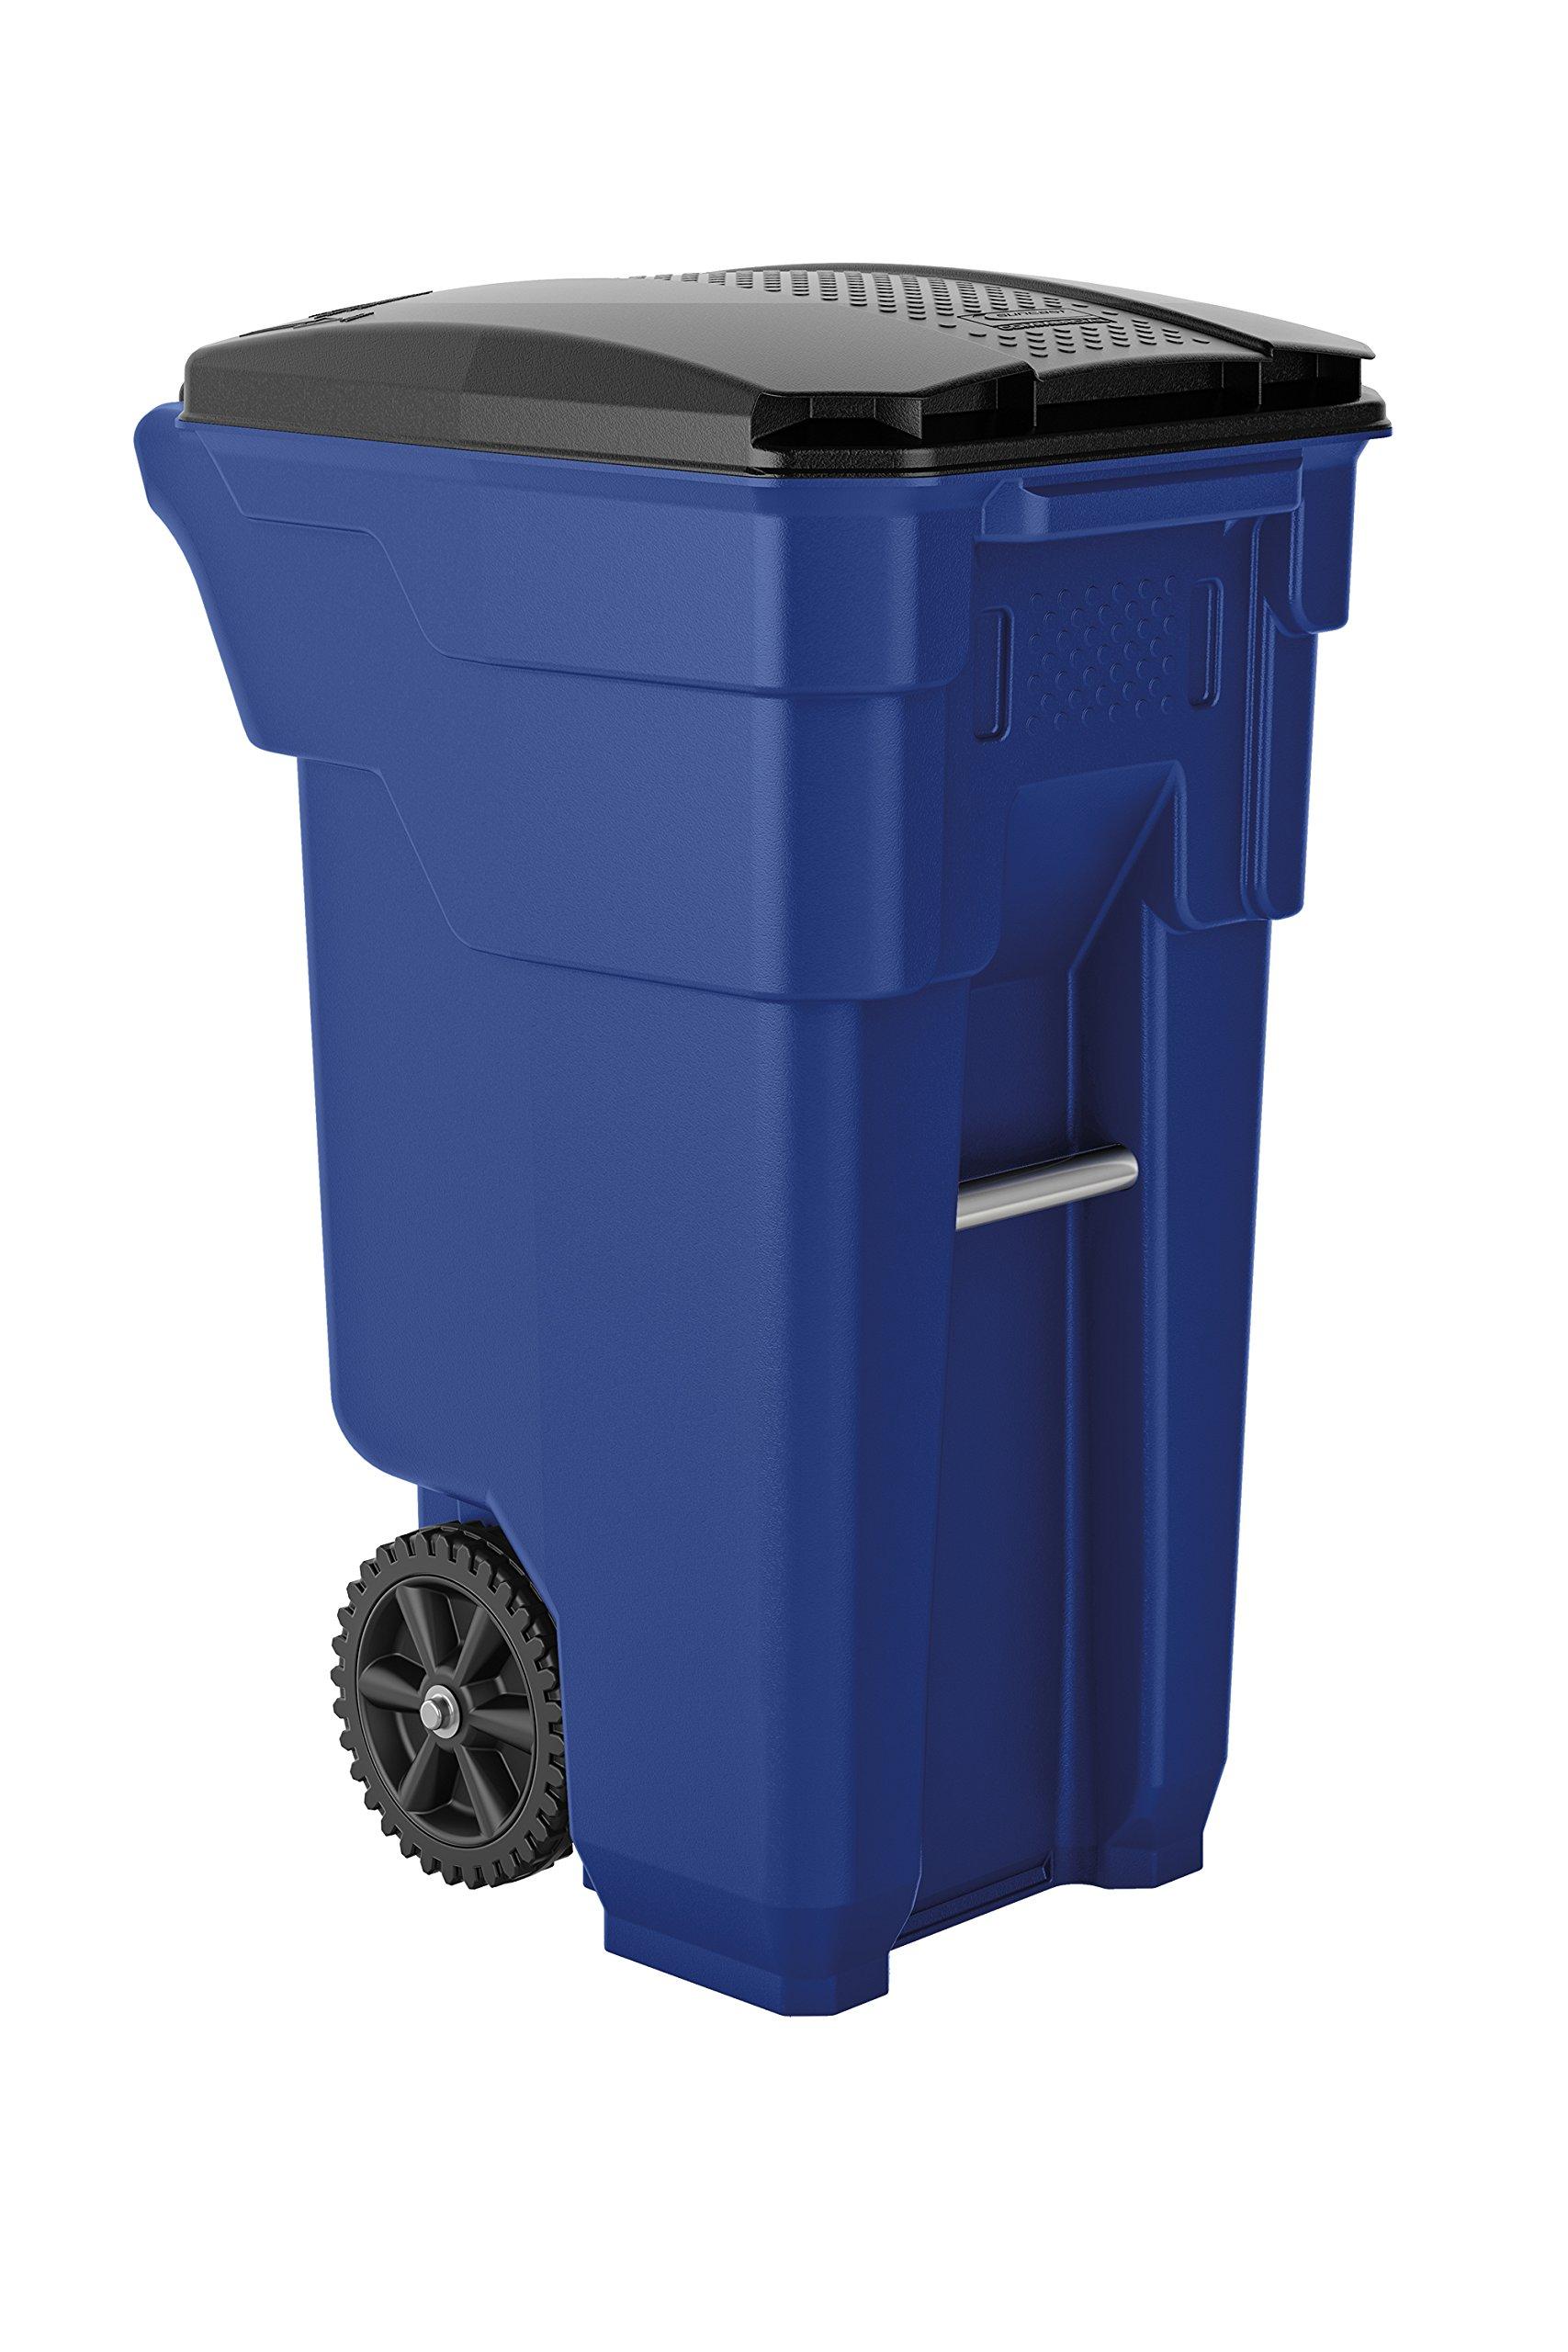 Suncast Commercial BMTCW32BL Wheeled Trash Can, 36.5'' Height, 20.25'' Width, 26.5'' Length, 32 gal Capacity, Polyethylene, Blue